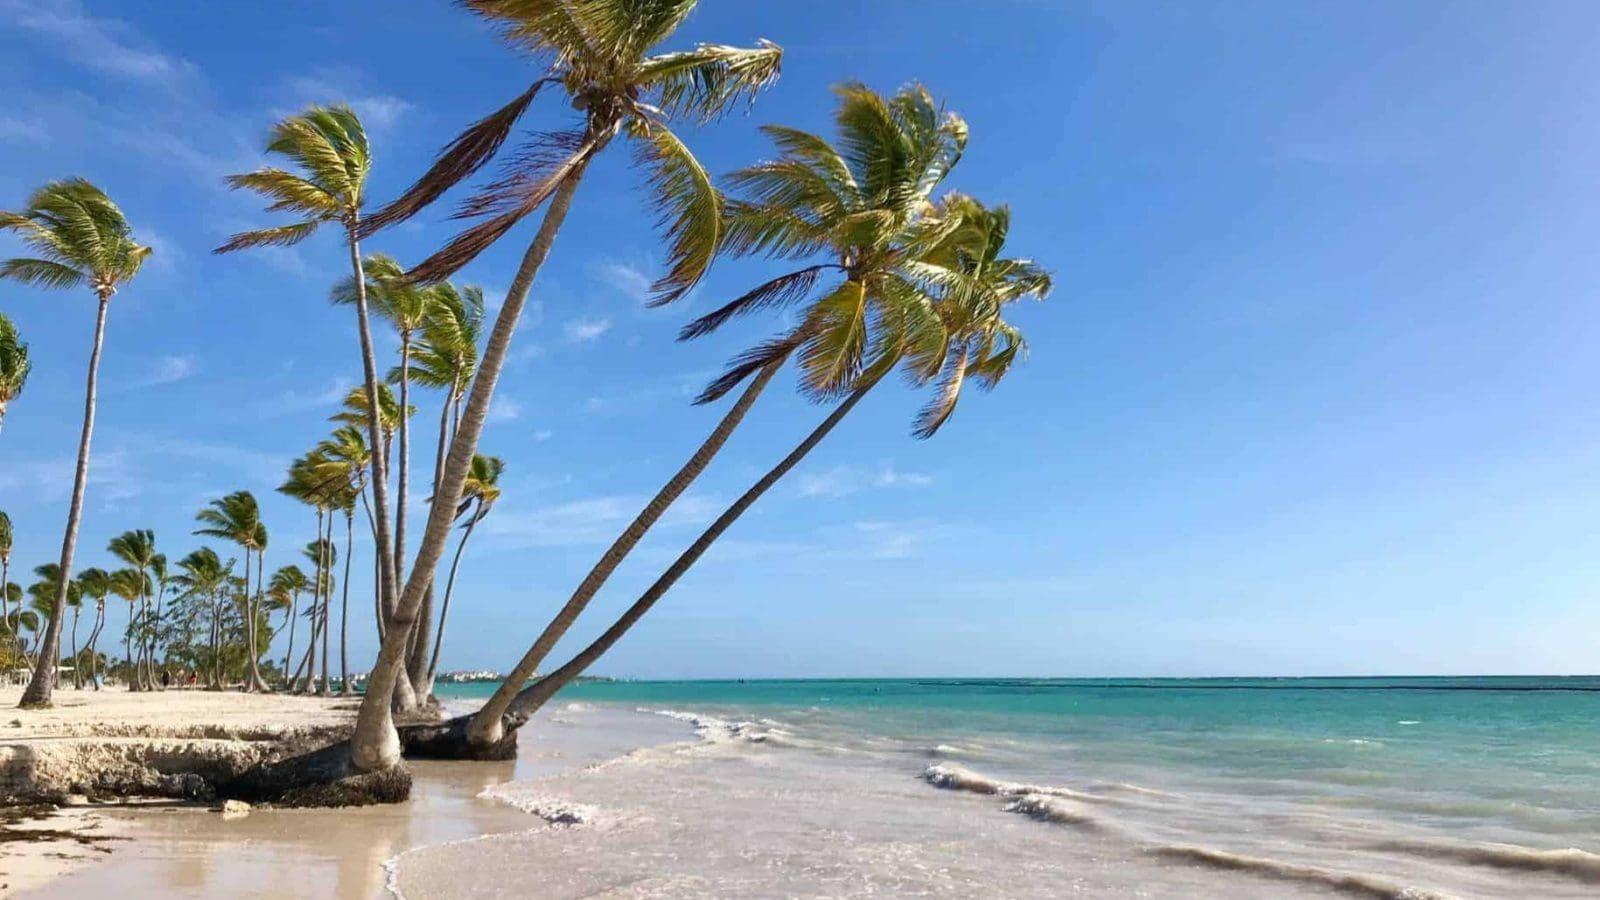 Juanillo Beach Cap Cana Punta Cana Dominican Republic